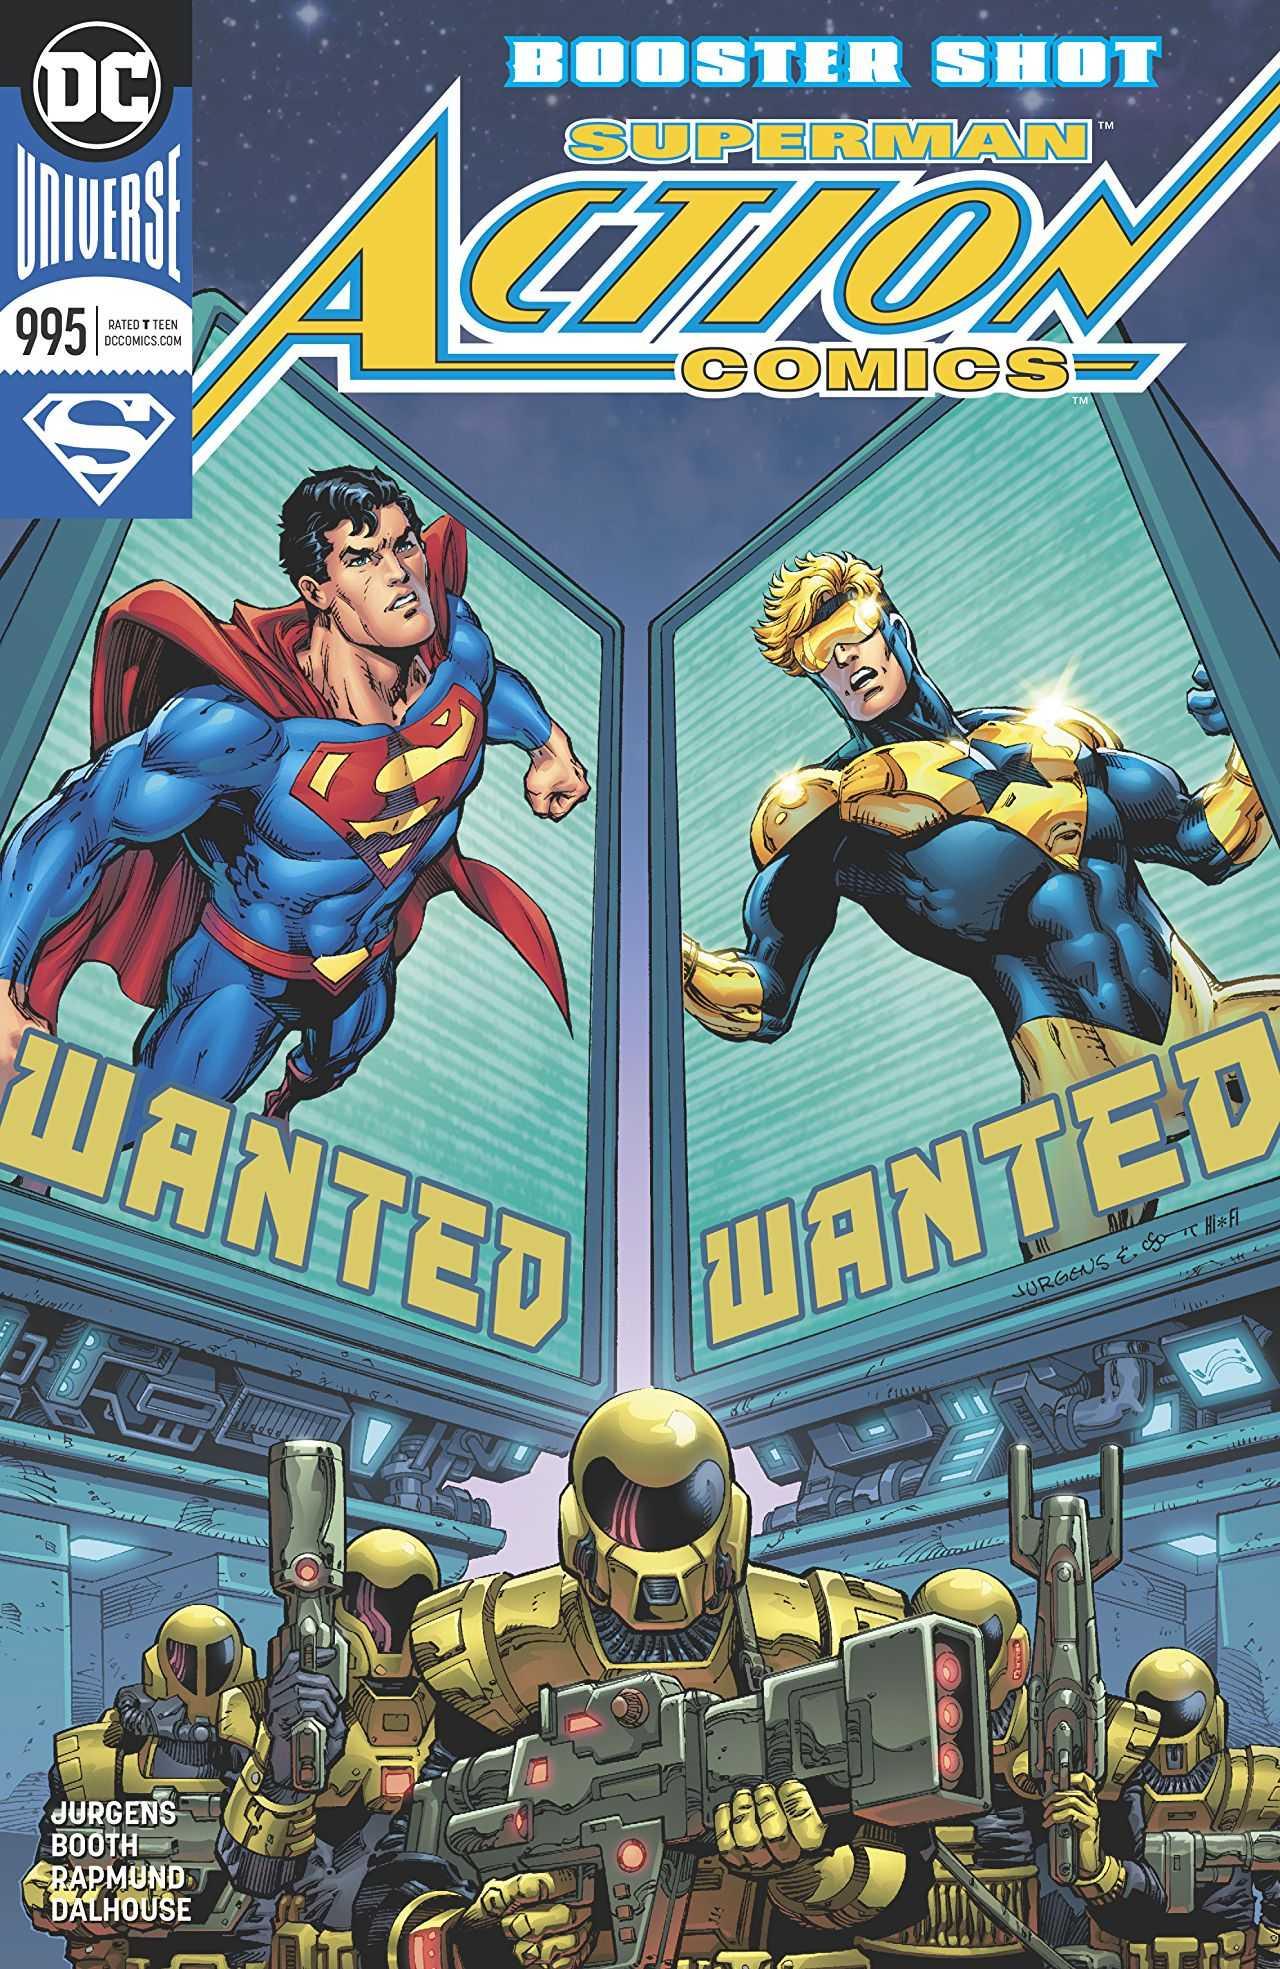 comics action comic dc booster superman vol shot books iii january week rebirth march 995a truth revenge gold eradicator previewsworld